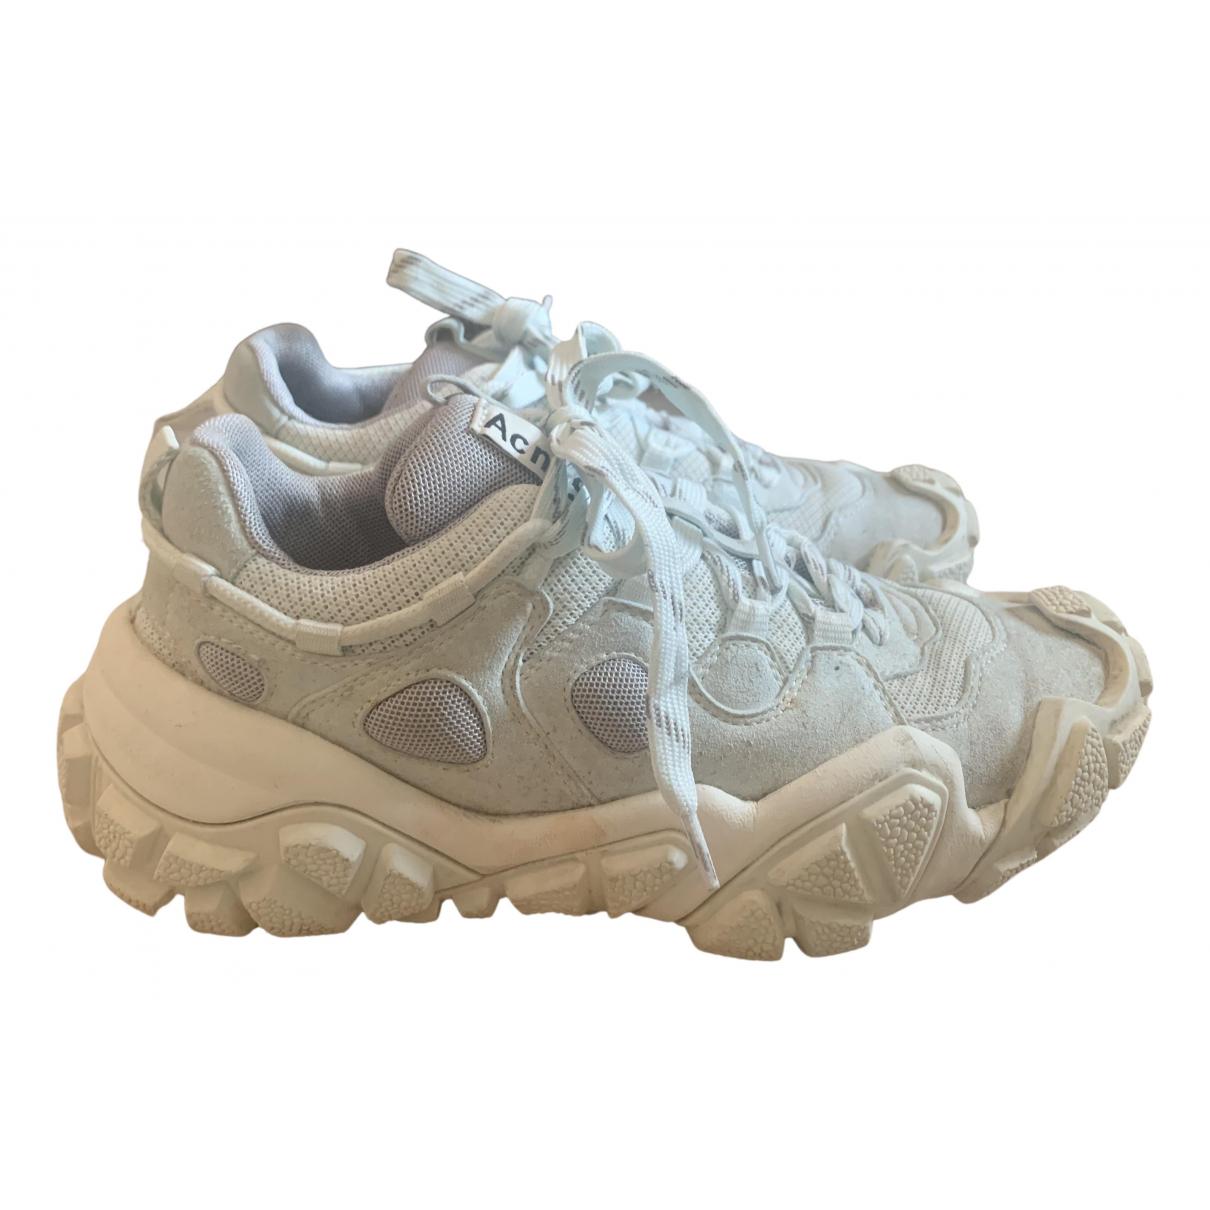 Acne Studios Bolzter Sneakers in  Weiss Leder